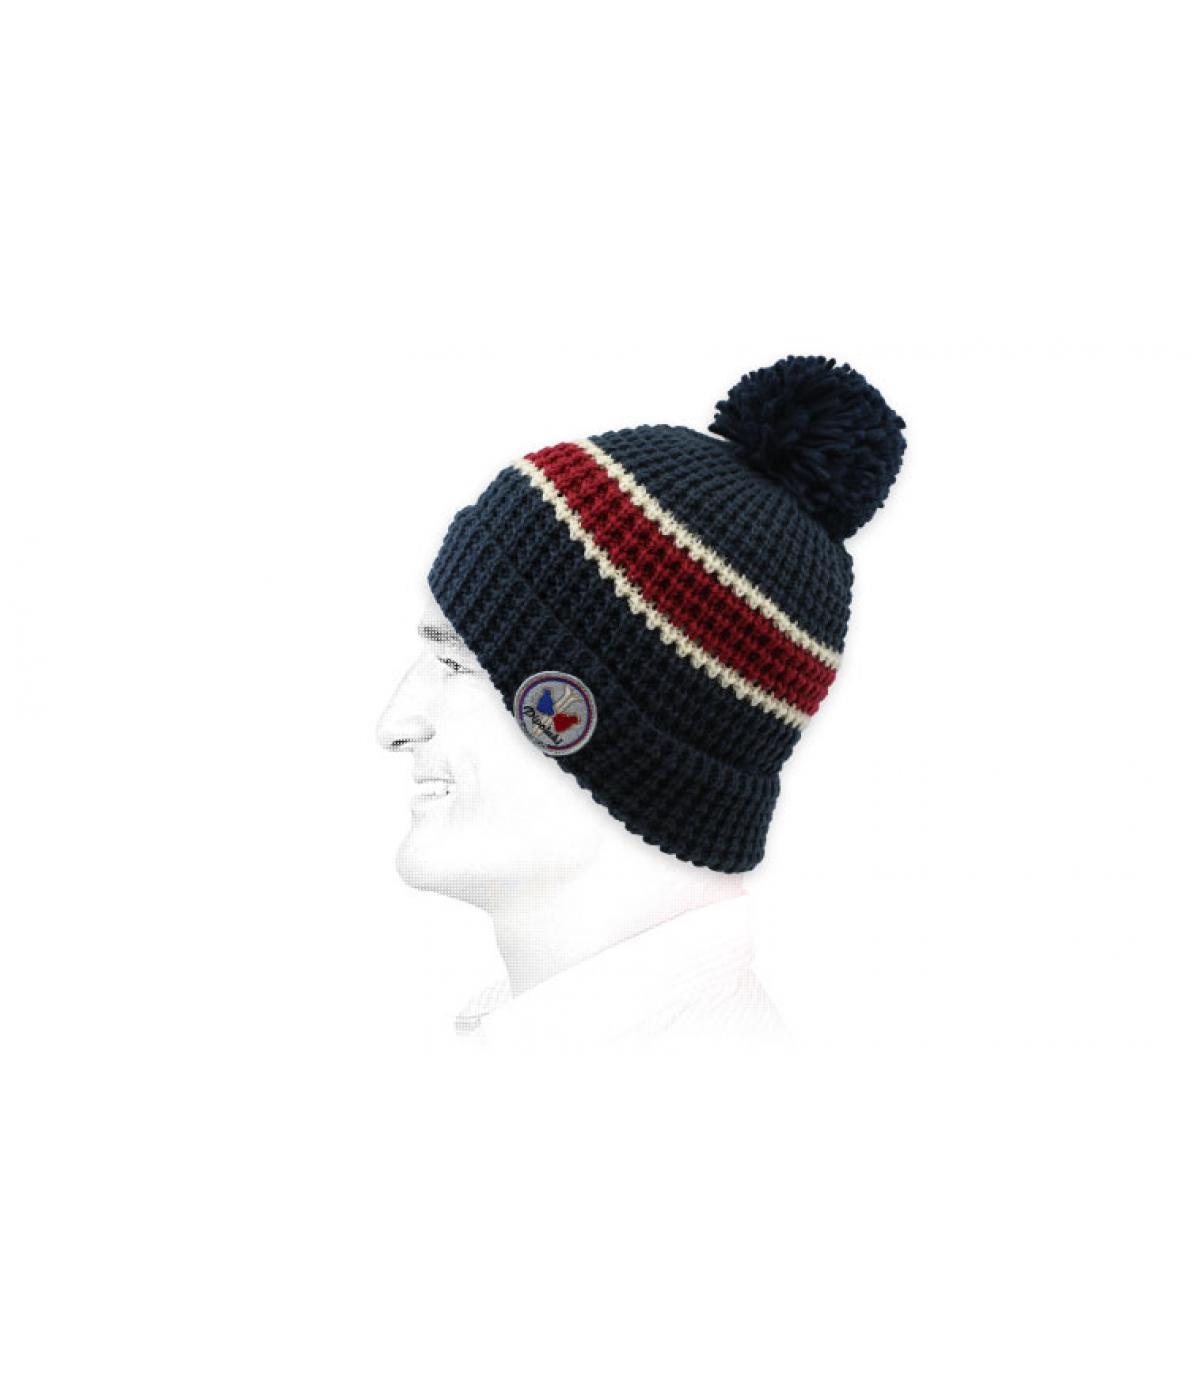 rode blauwe streep hoed